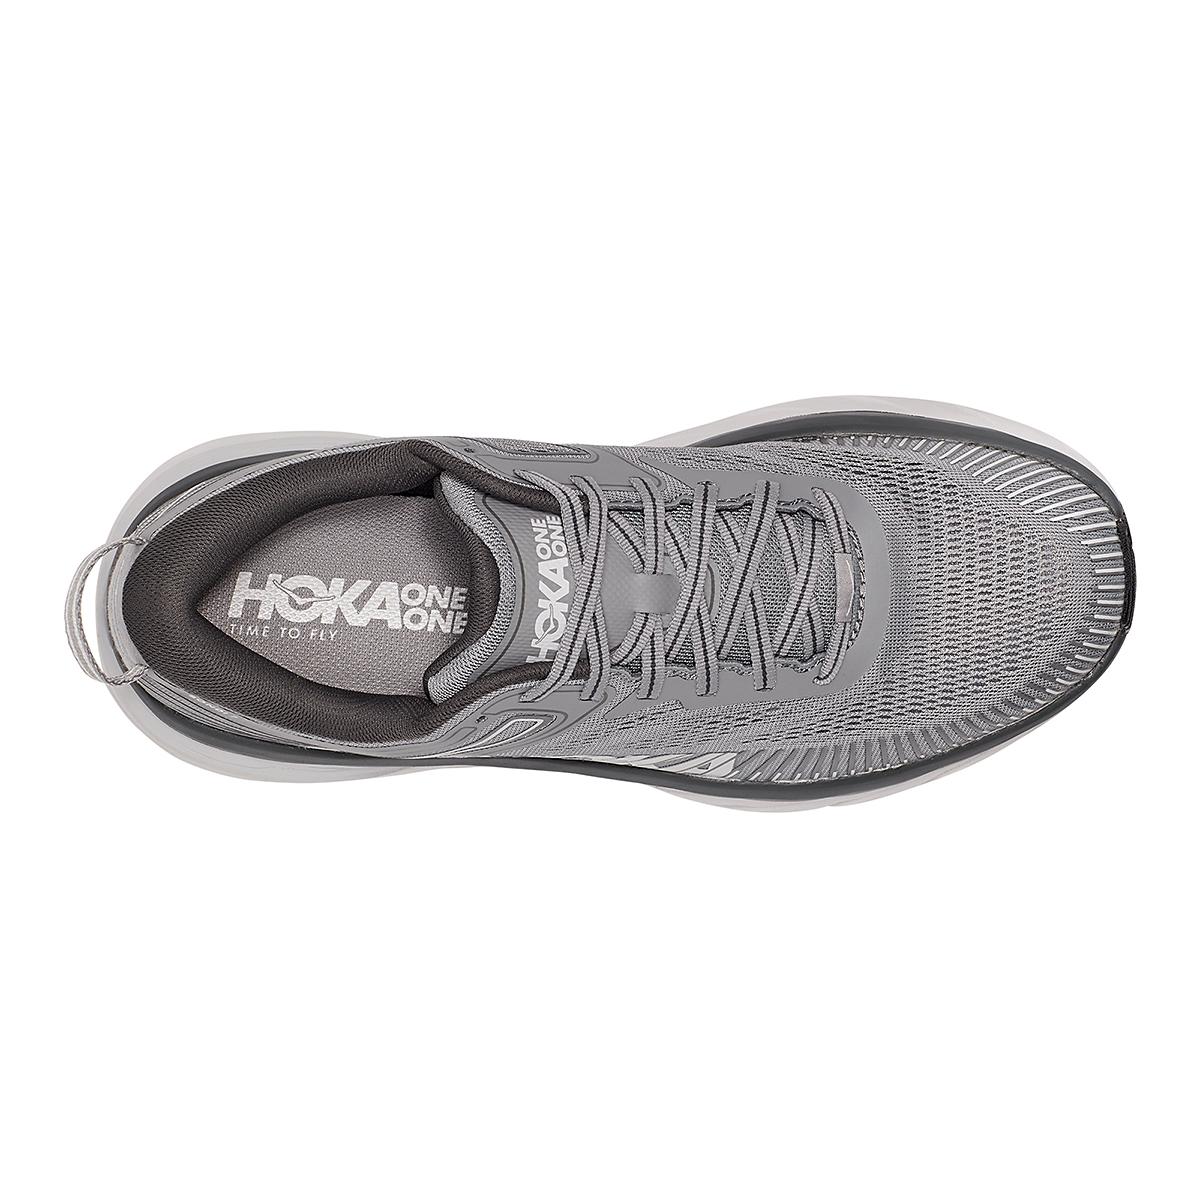 Men's Hoka One One Bondi 7 Running Shoe - Color: Wild Dove/Dark Shadow - Size: 7 - Width: Regular, Wild Dove/Dark Shadow, large, image 5